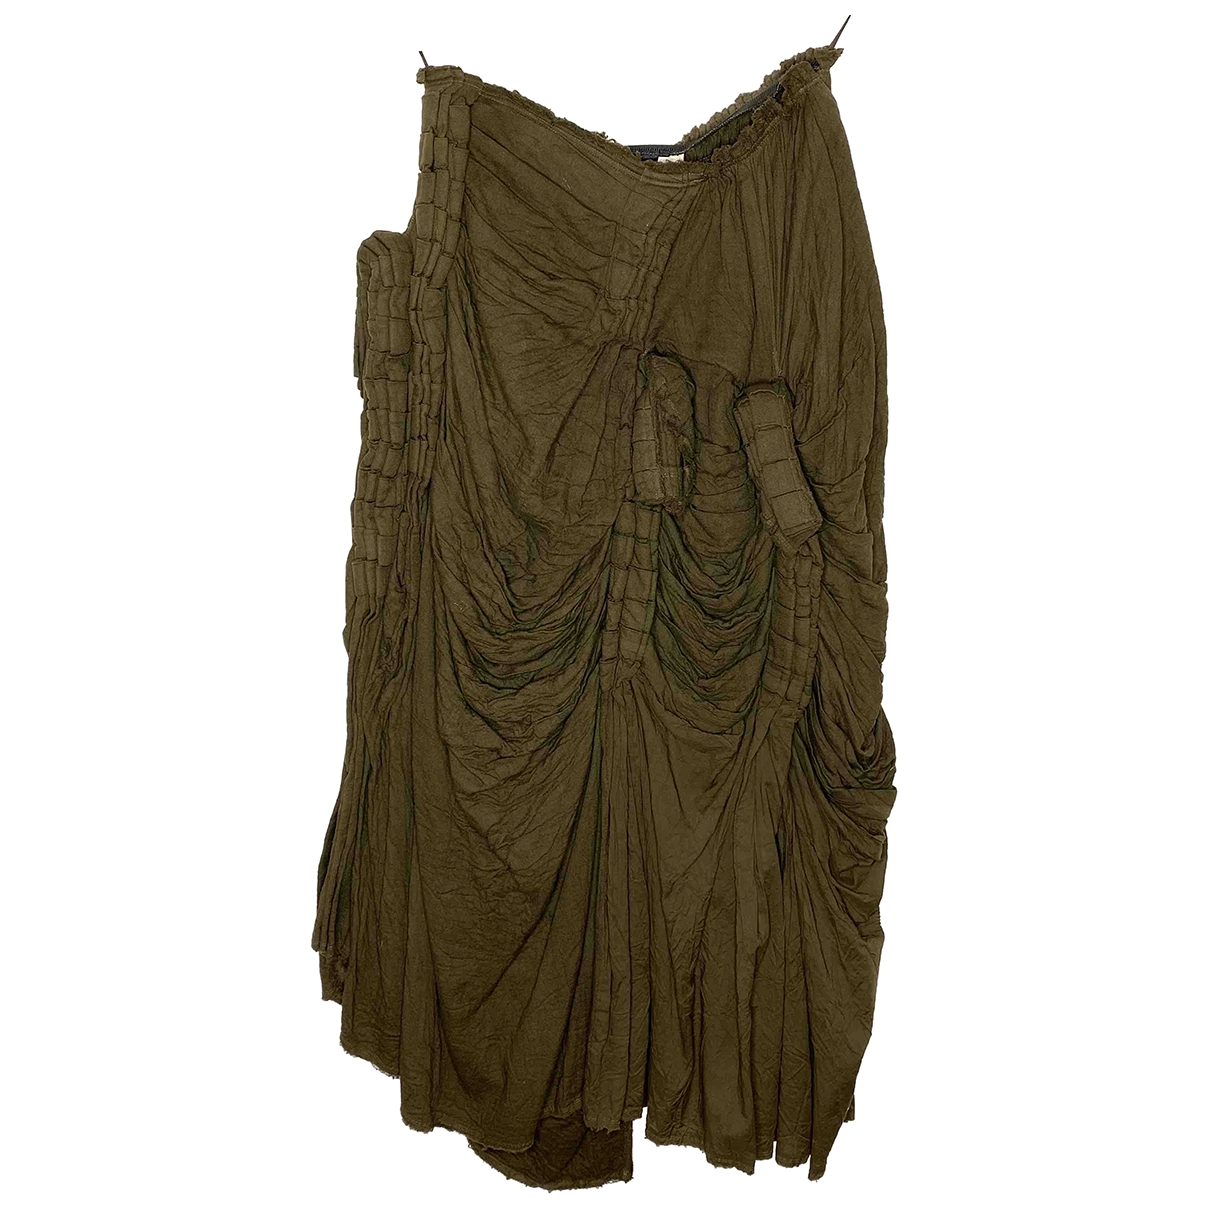 Comme Des Garcons \N Khaki Cotton skirt for Women S International